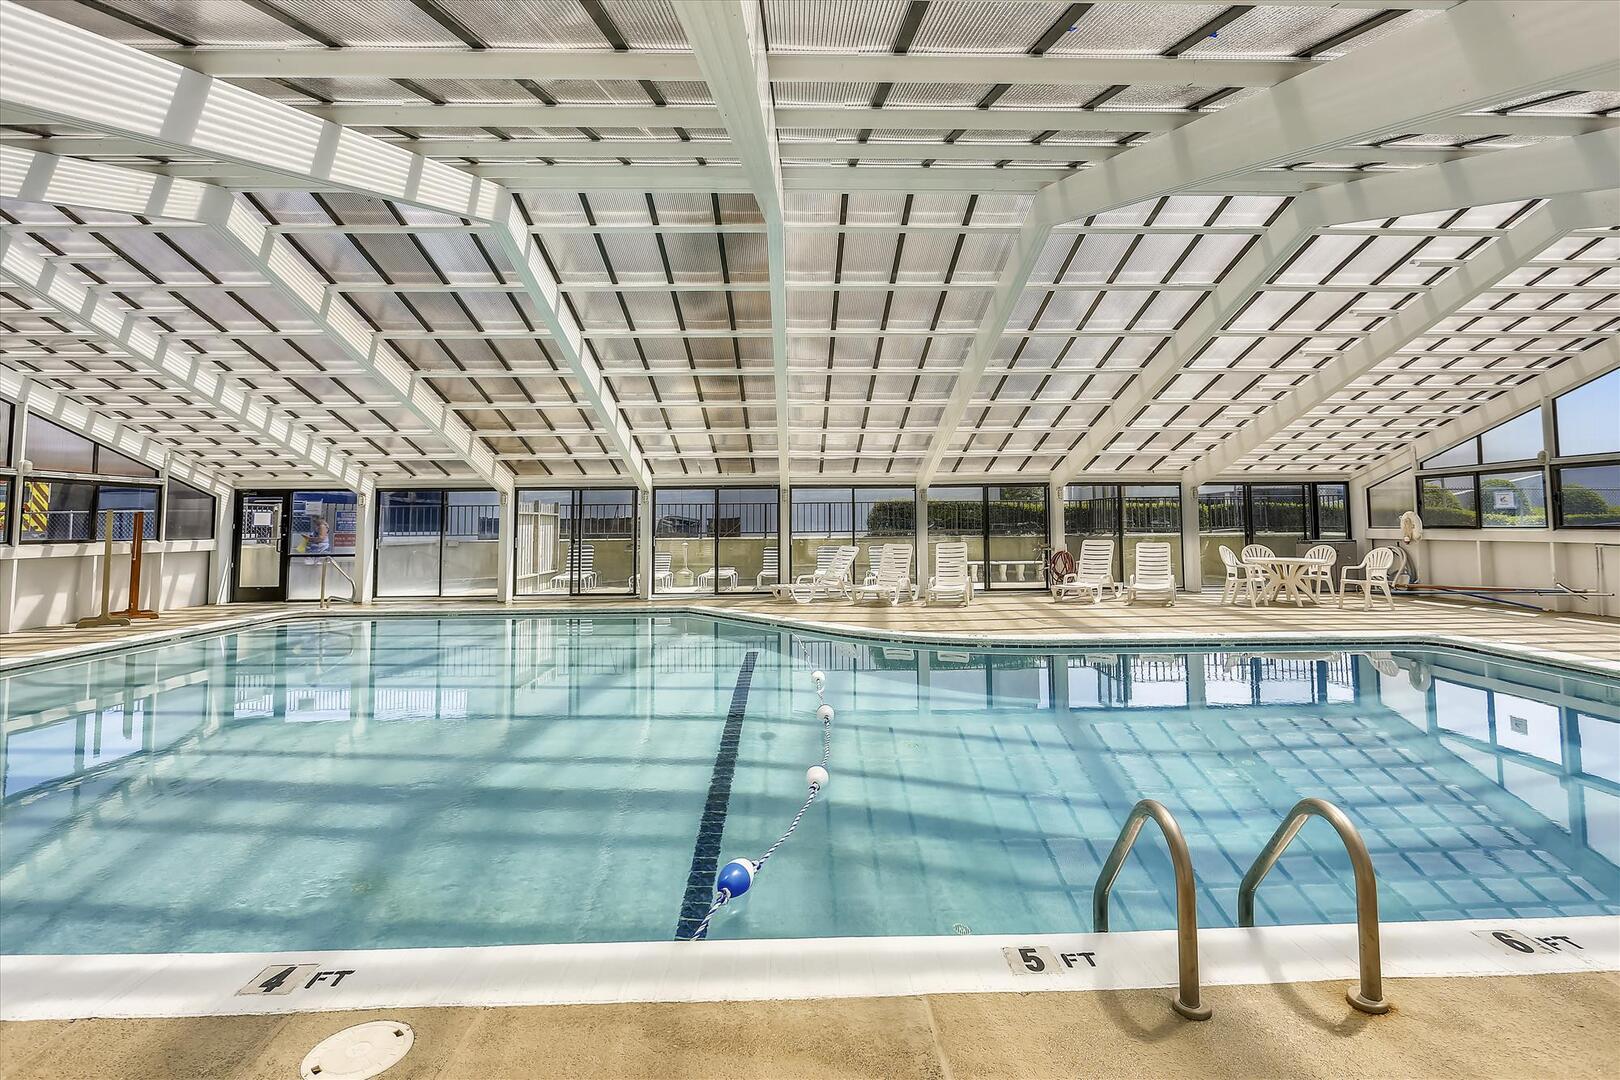 Pool of Century I Building